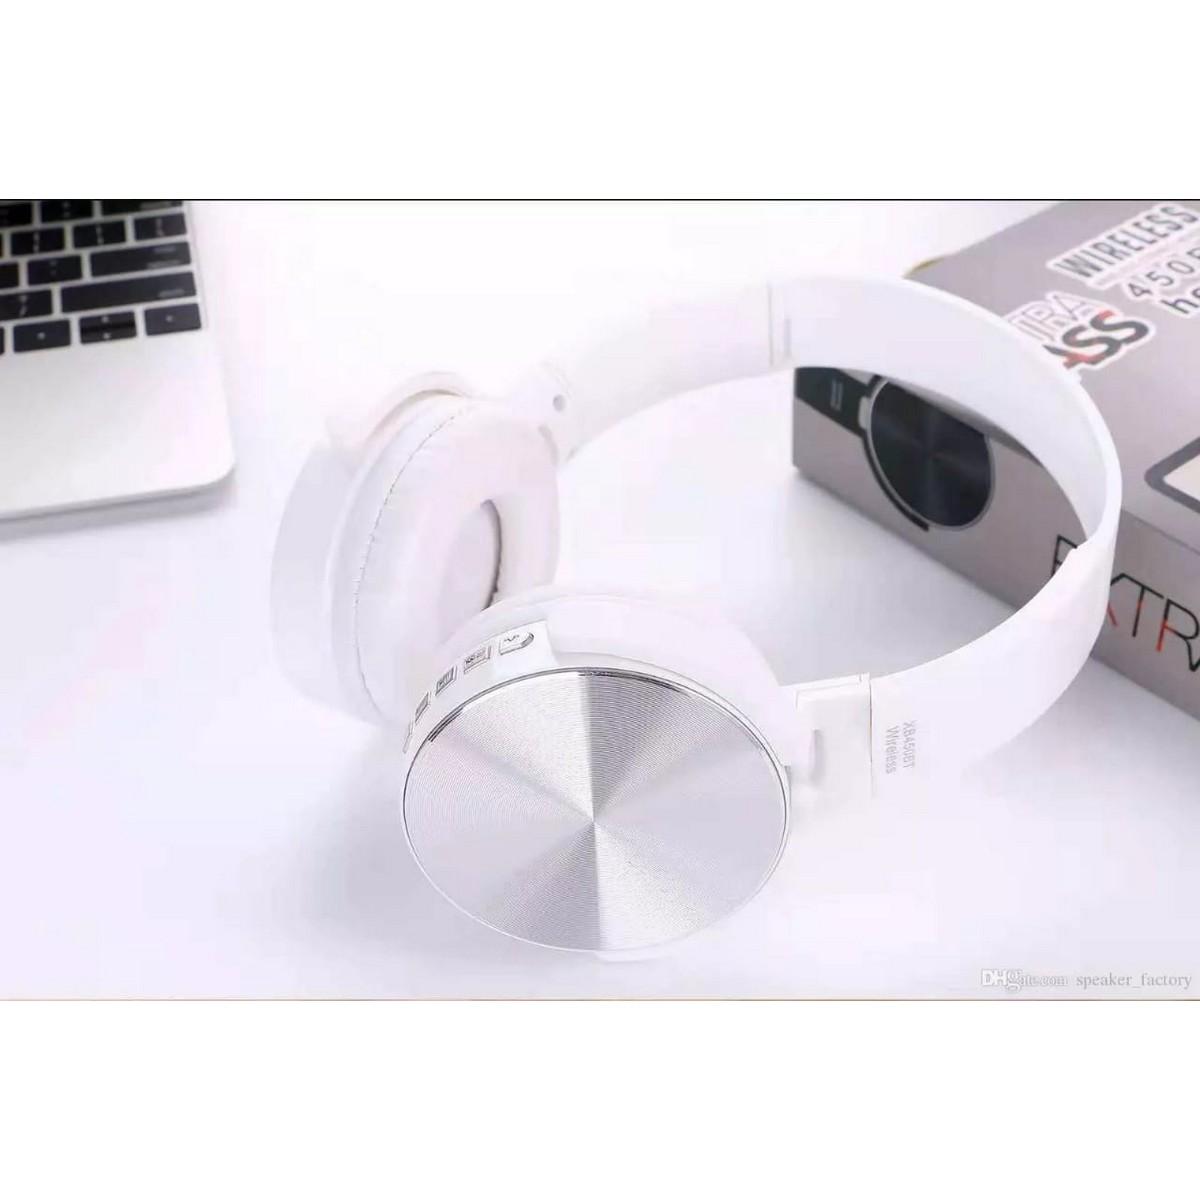 New head phone 450 BT Extra Bass Wireless Bluetooth Headphone With Good Quality Sound- Black